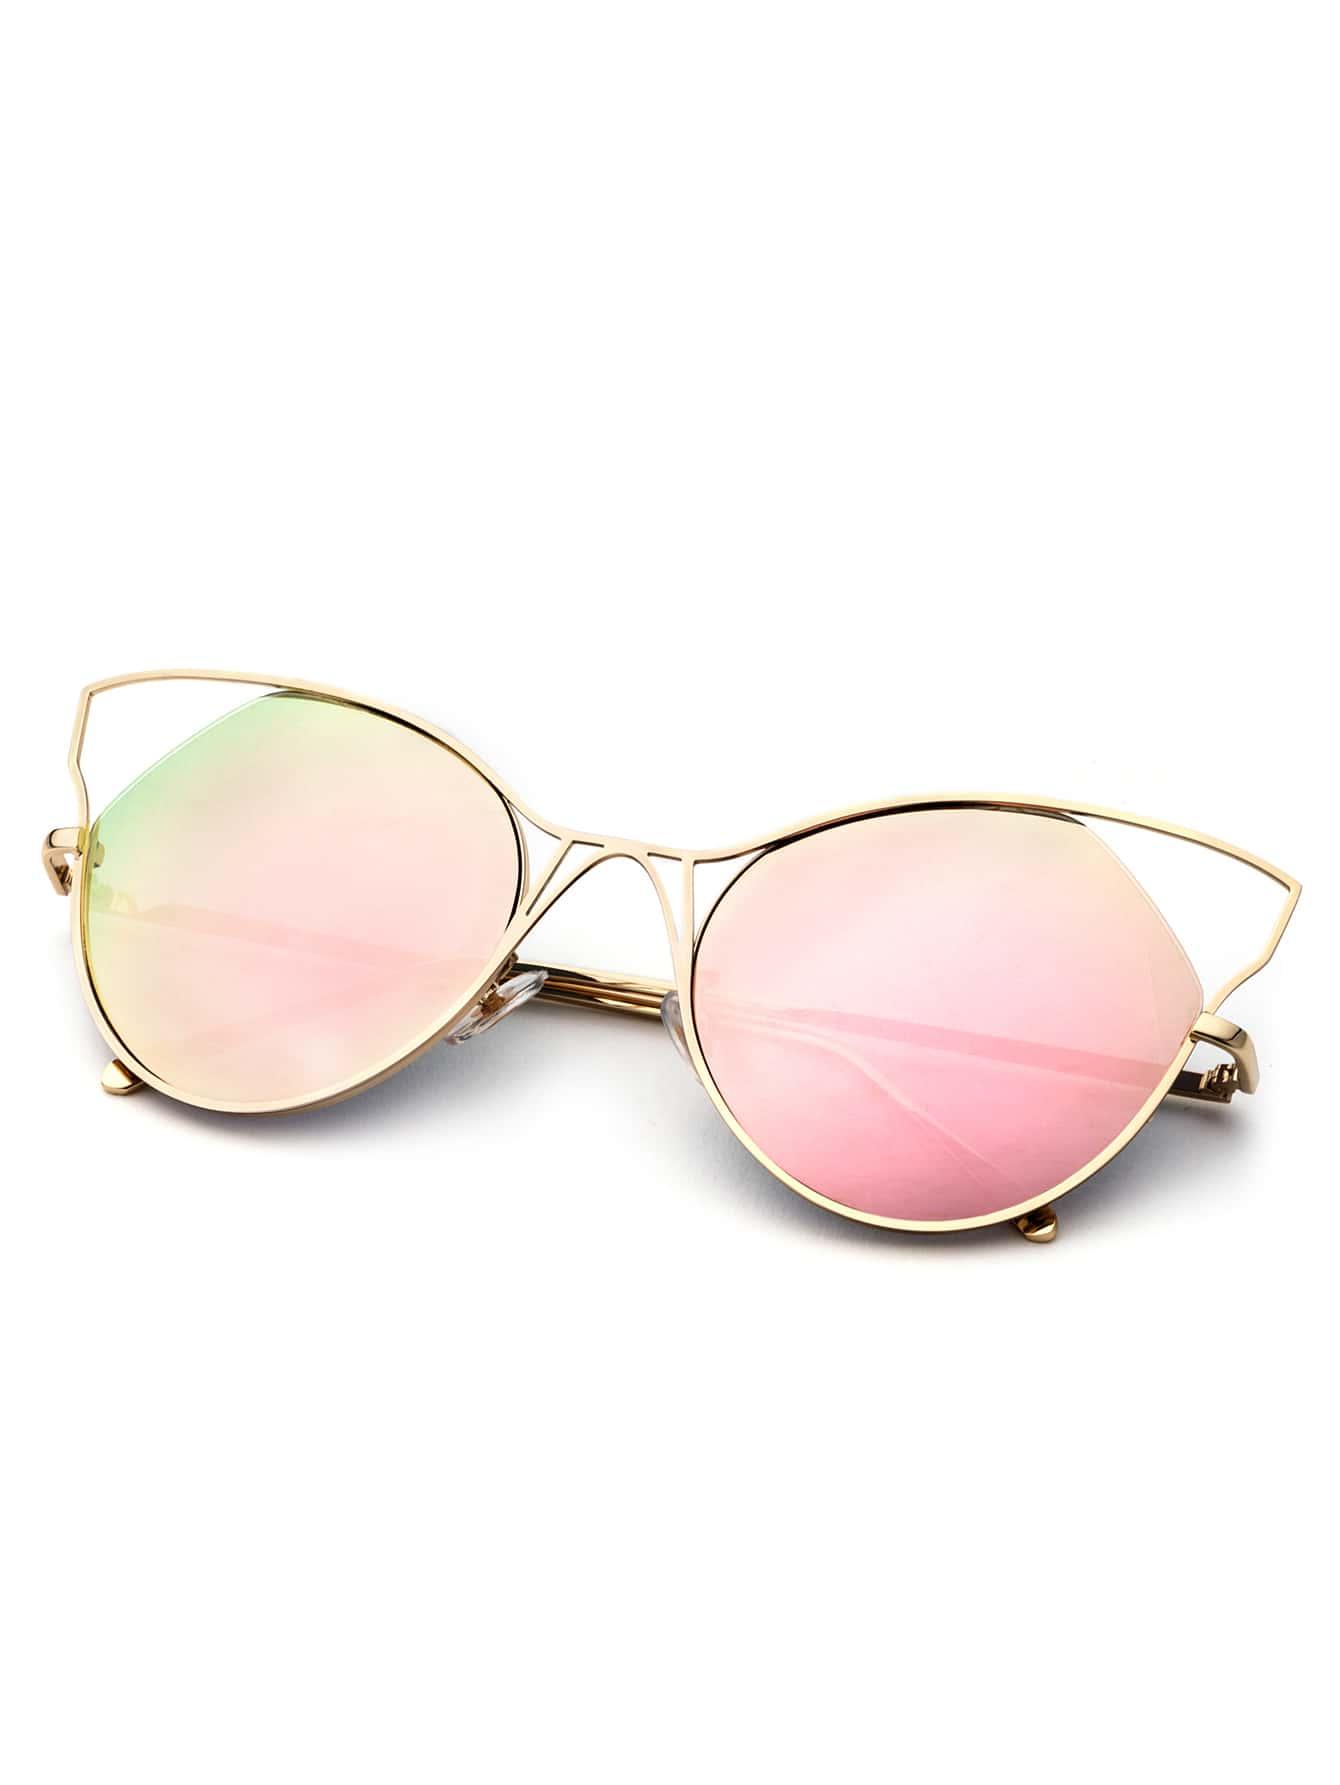 Gold Frame Cat Eye Sunglasses : Gold Frame Pink Cat Eye Sunglasses -SheIn(Sheinside)